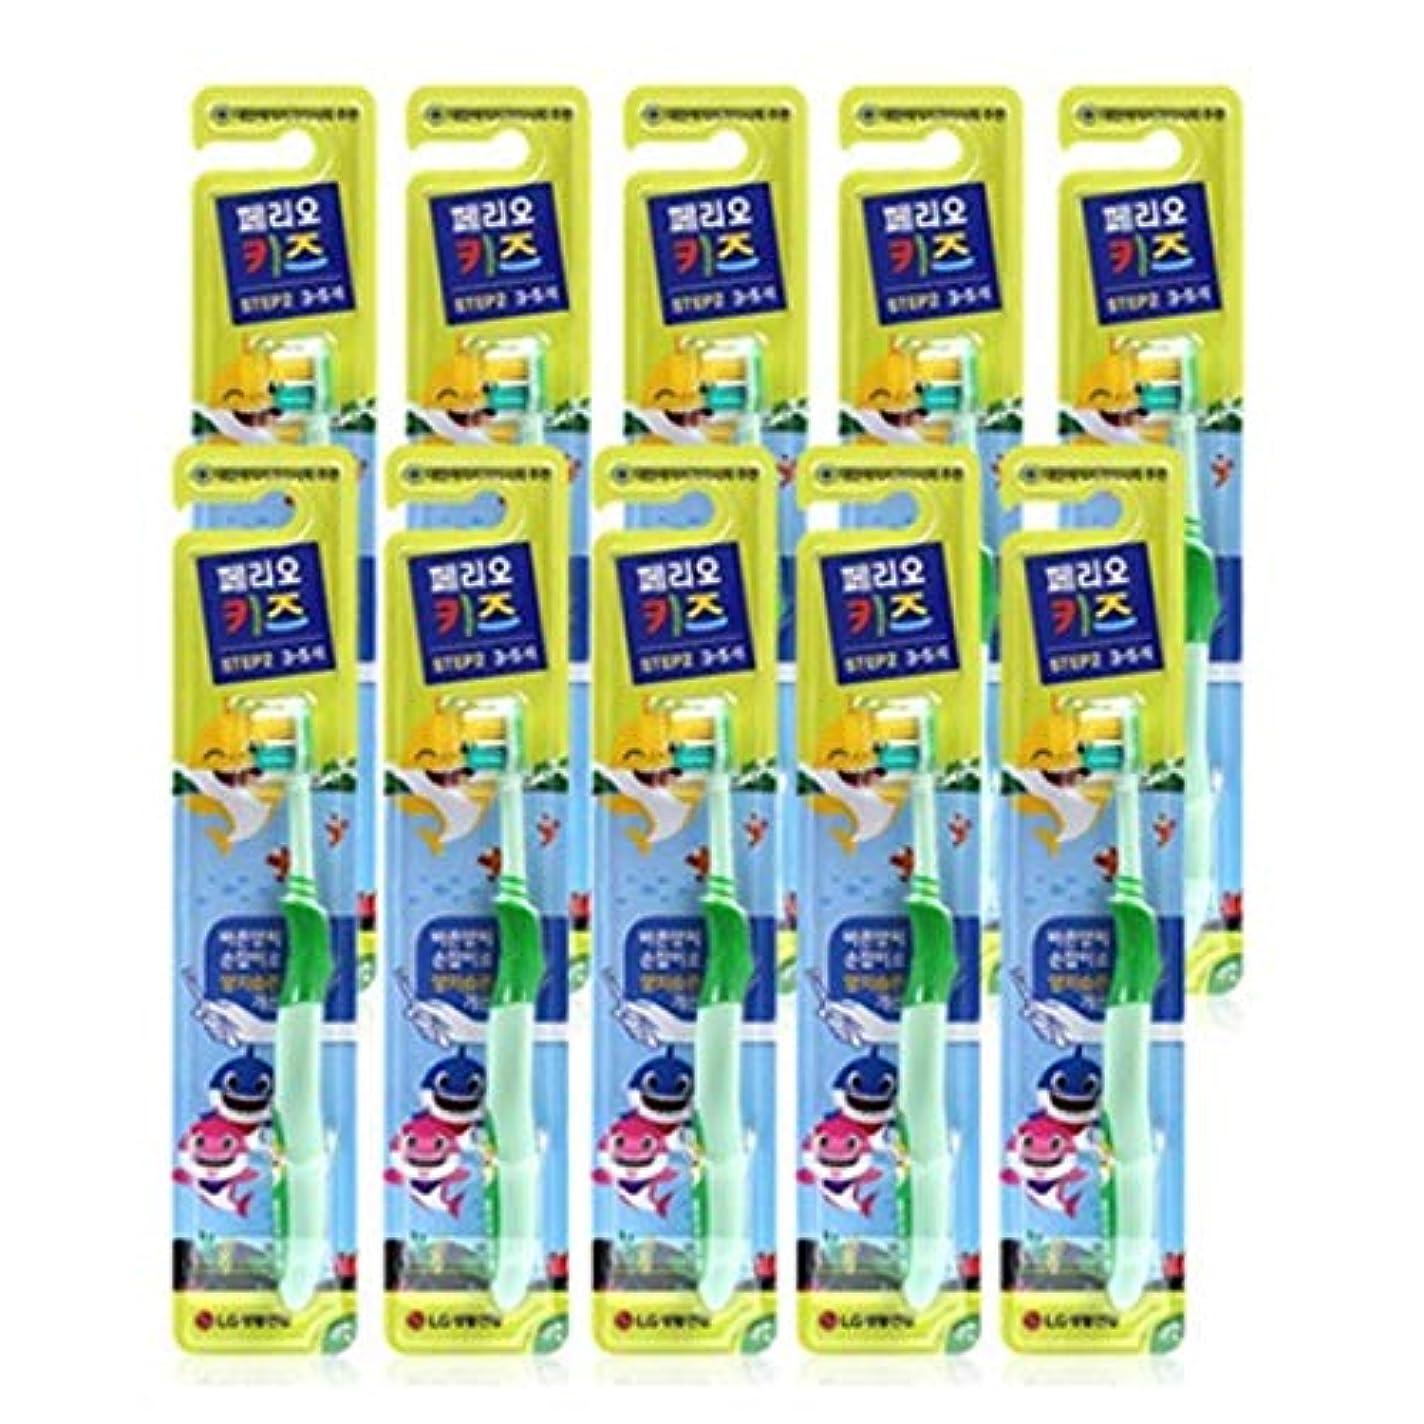 [LG HnB] Perio Kids Toothbrush Step 2 / ペリオ子供歯ブラシ2段階 1口x10個(海外直送品)